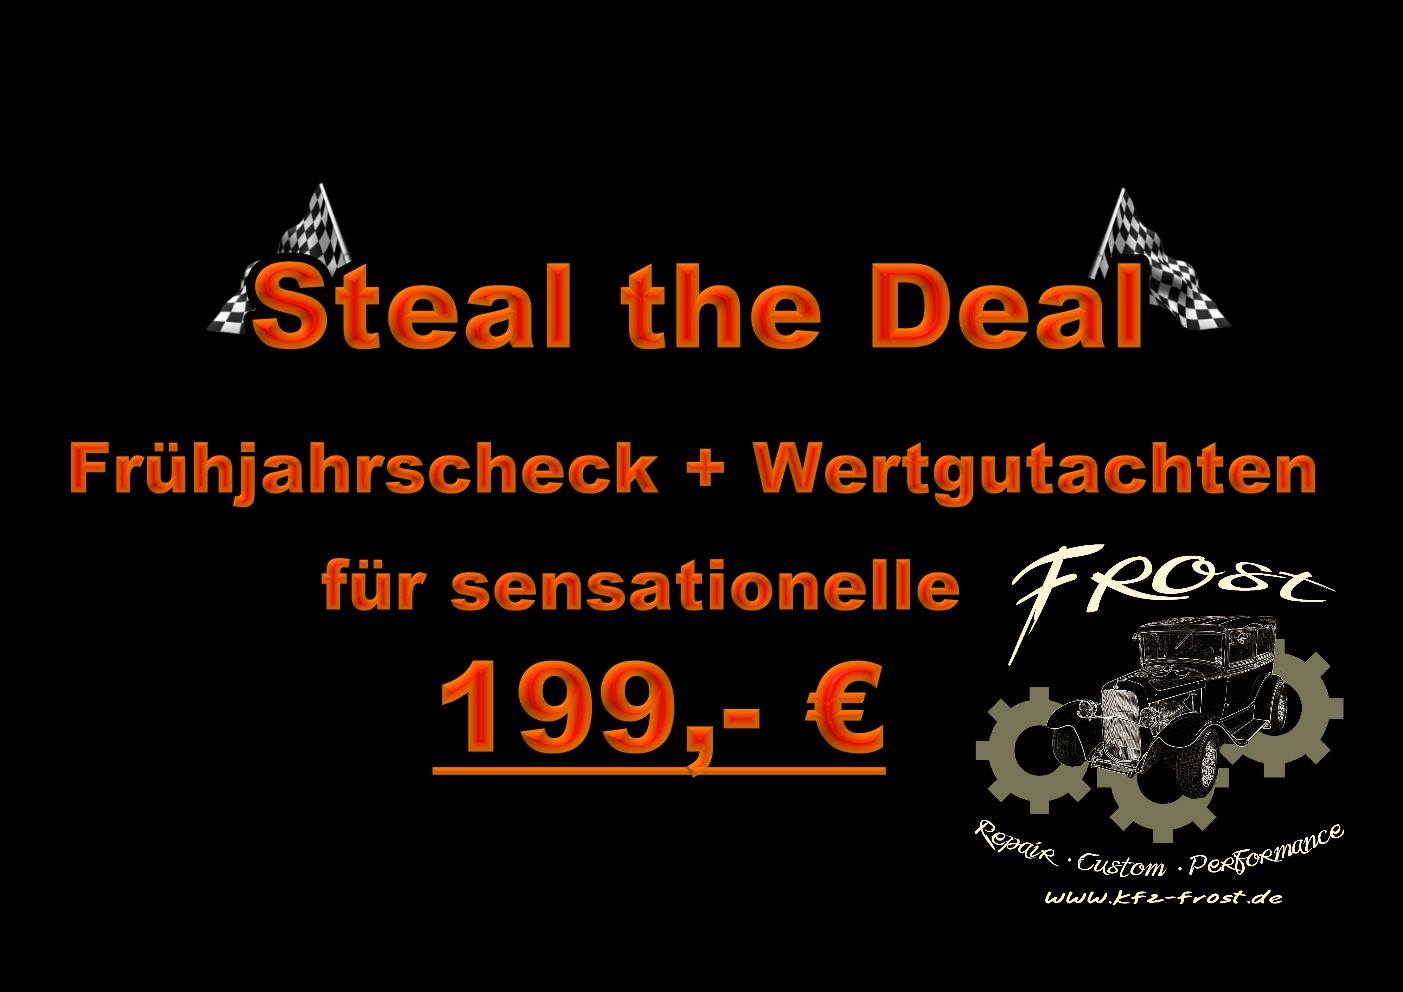 Steal Deal 2019